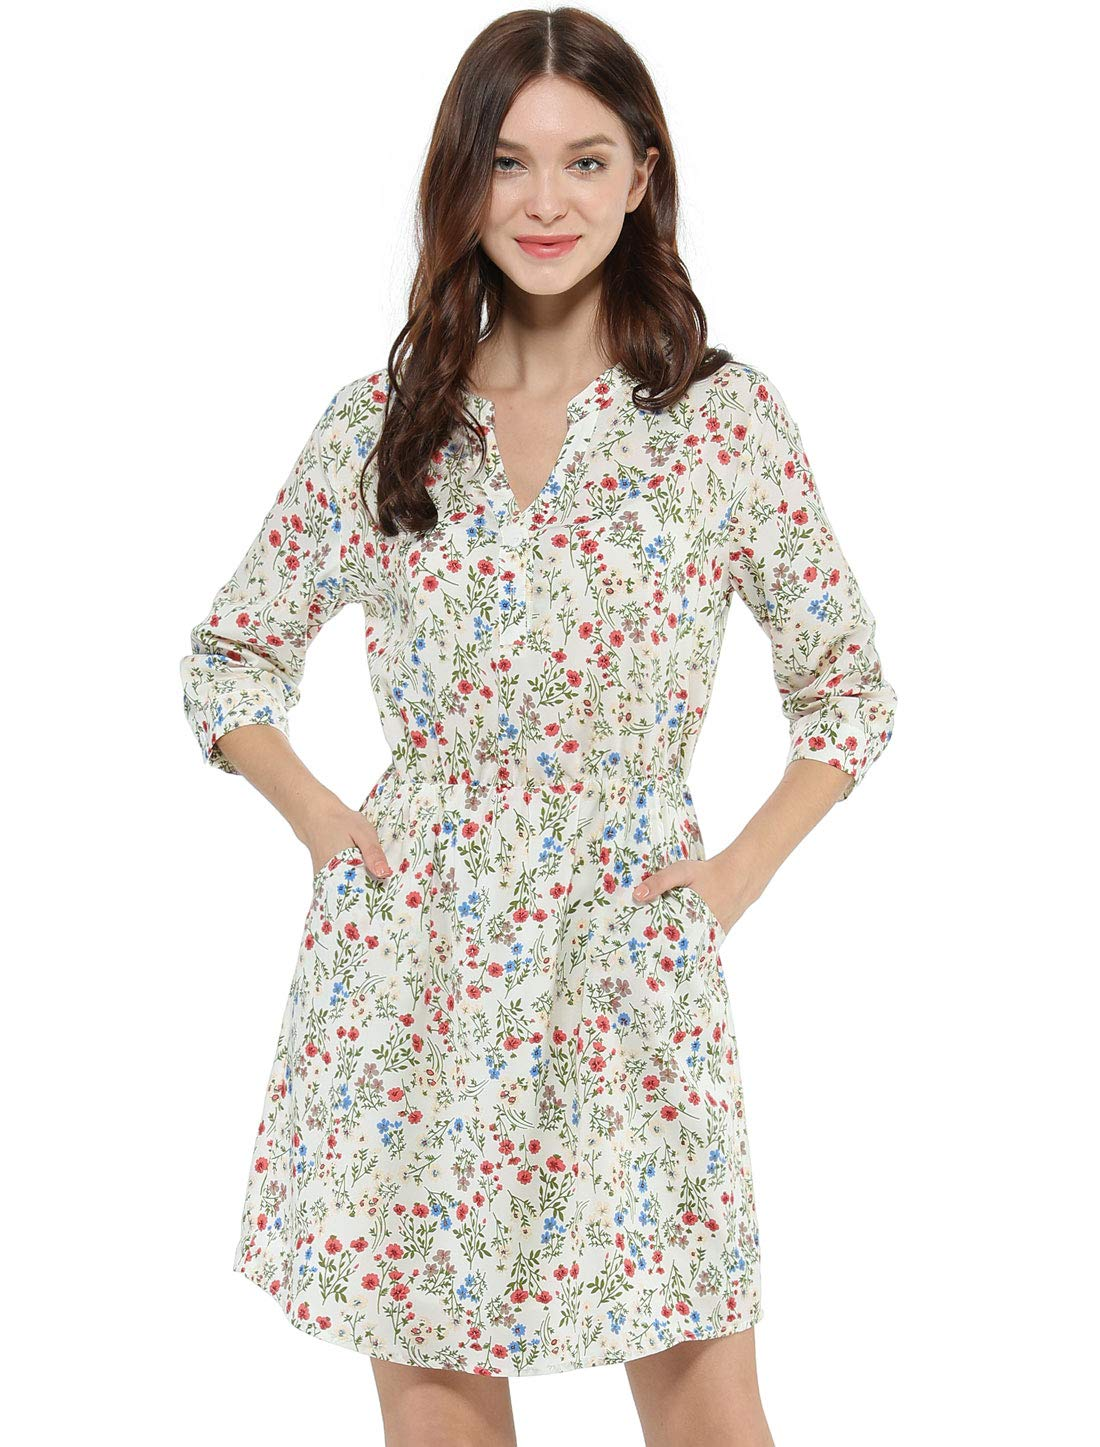 Allegra K 女士纽扣花卉印花 V 领口袋连衣裙